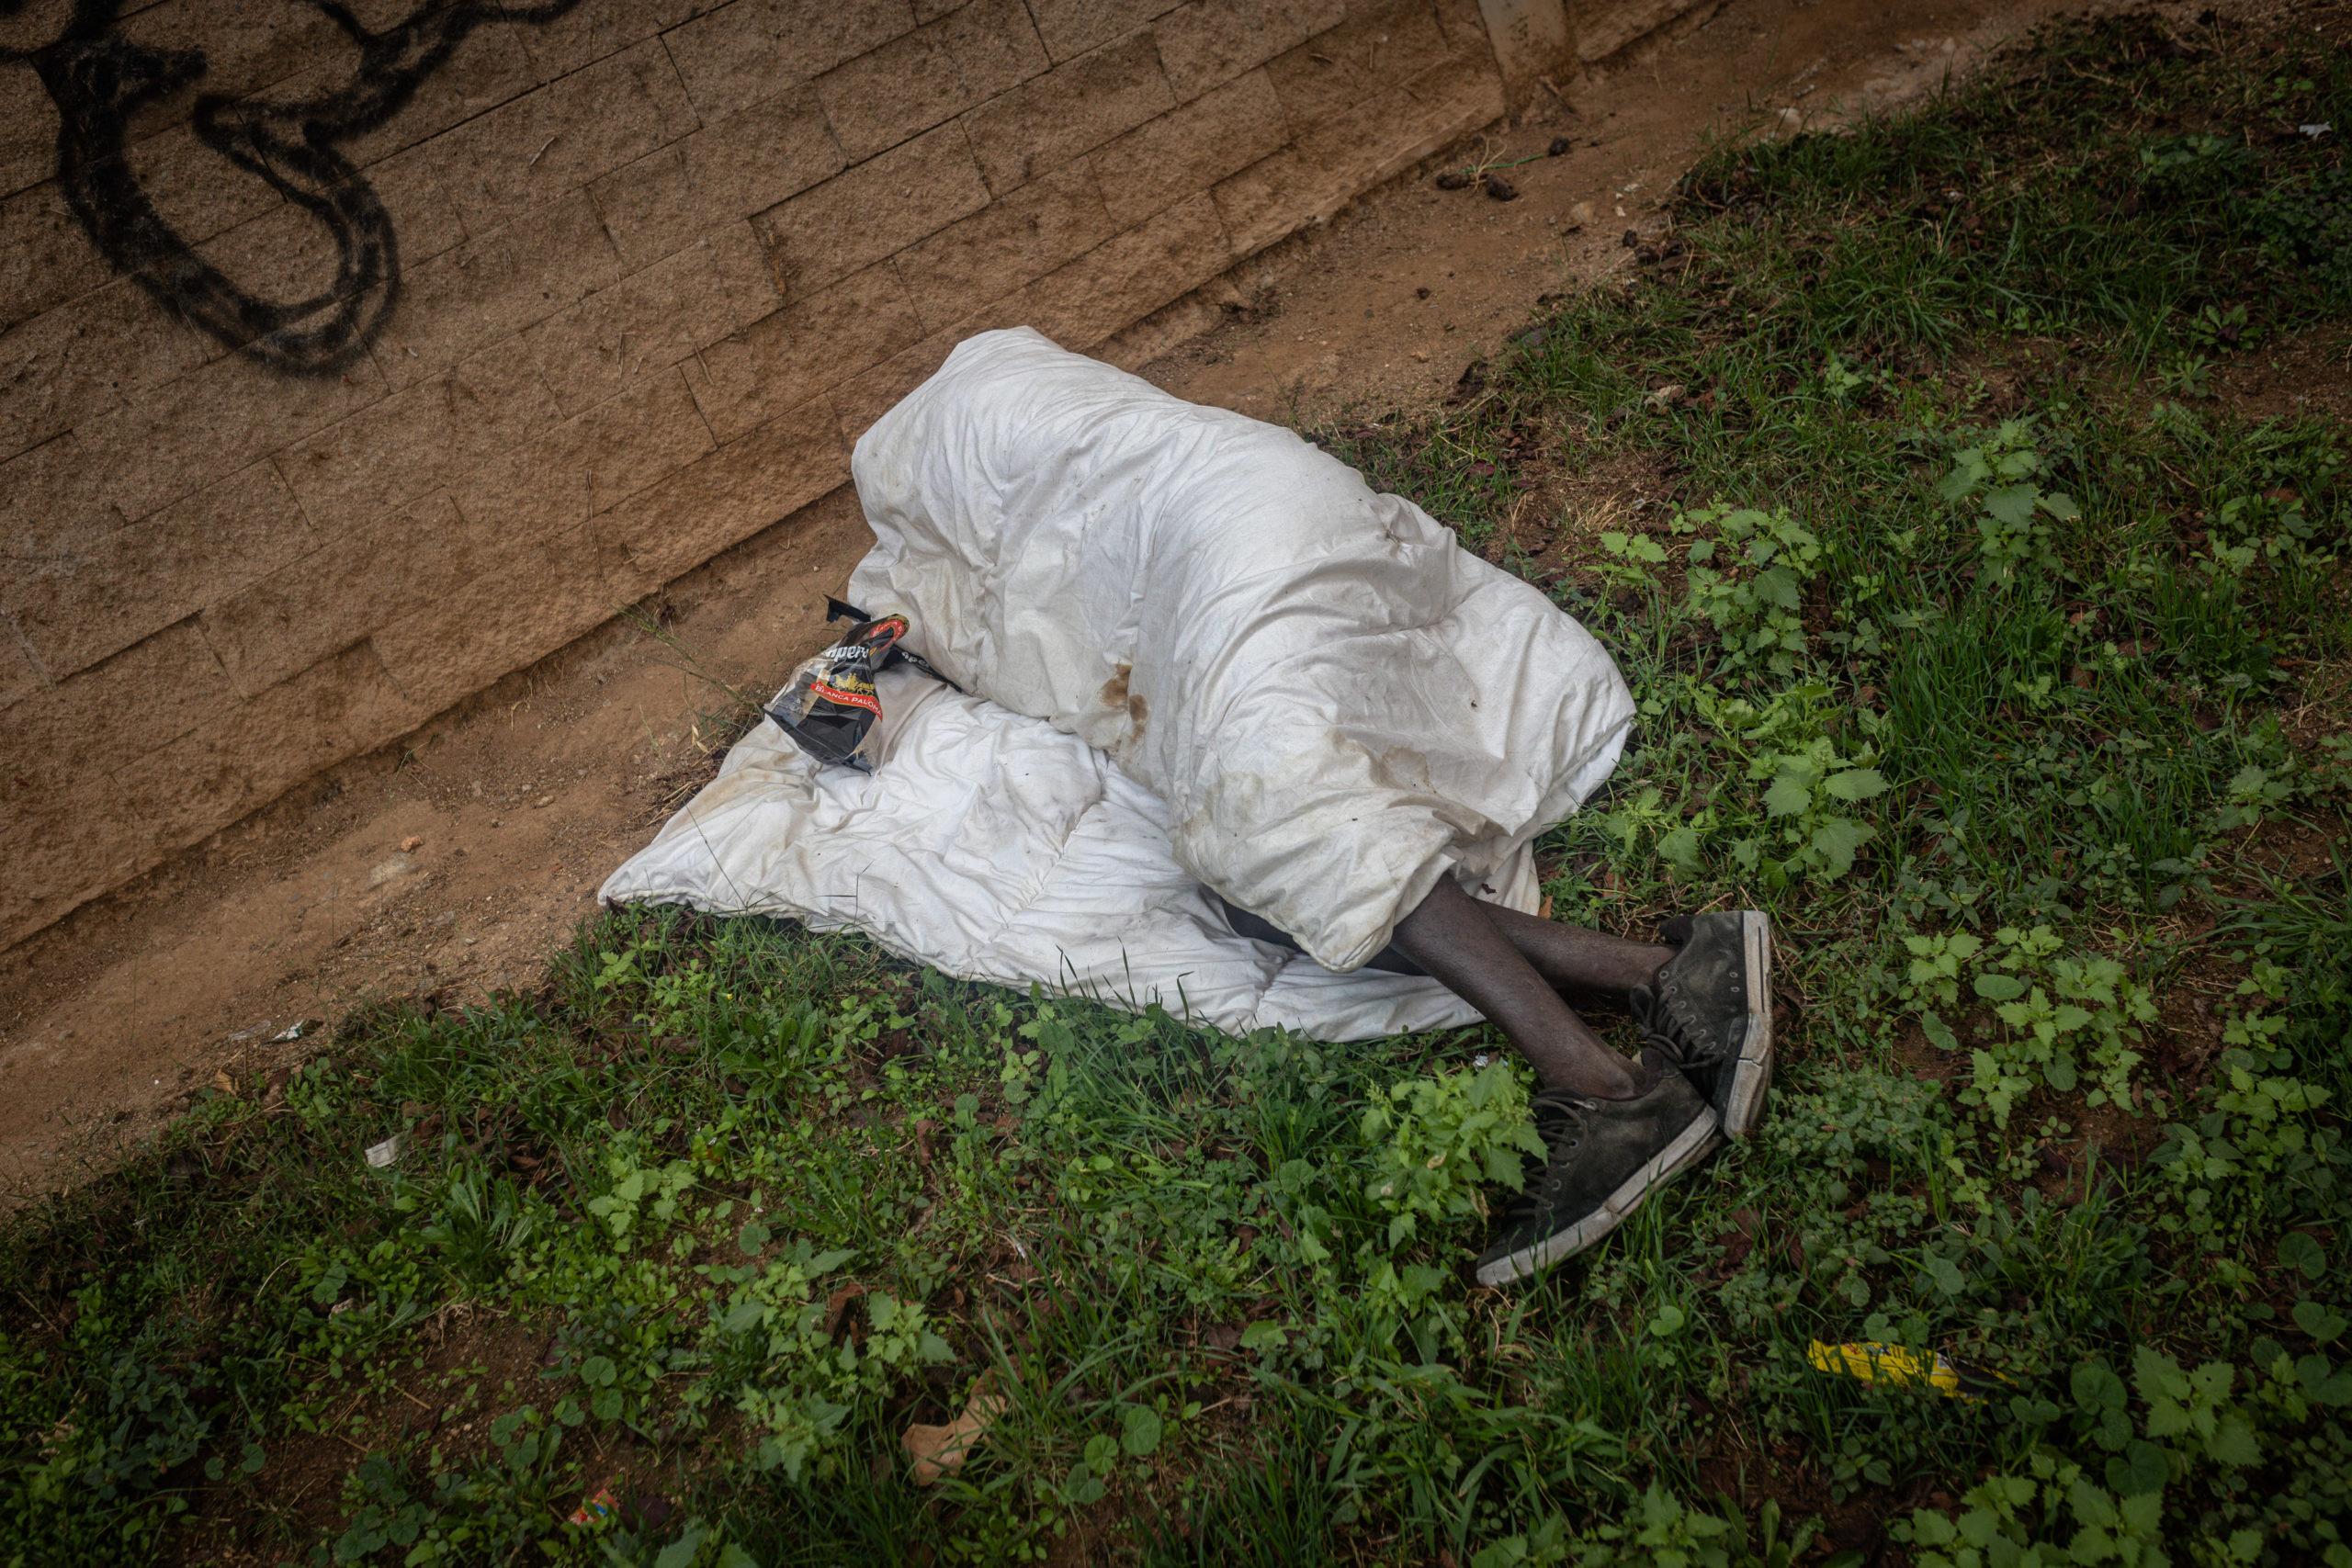 press,photo,photojournalism,photography,covid-19,coronavirus,epidemic,pandemic,crisis,spain,catalonia,migration,poverty